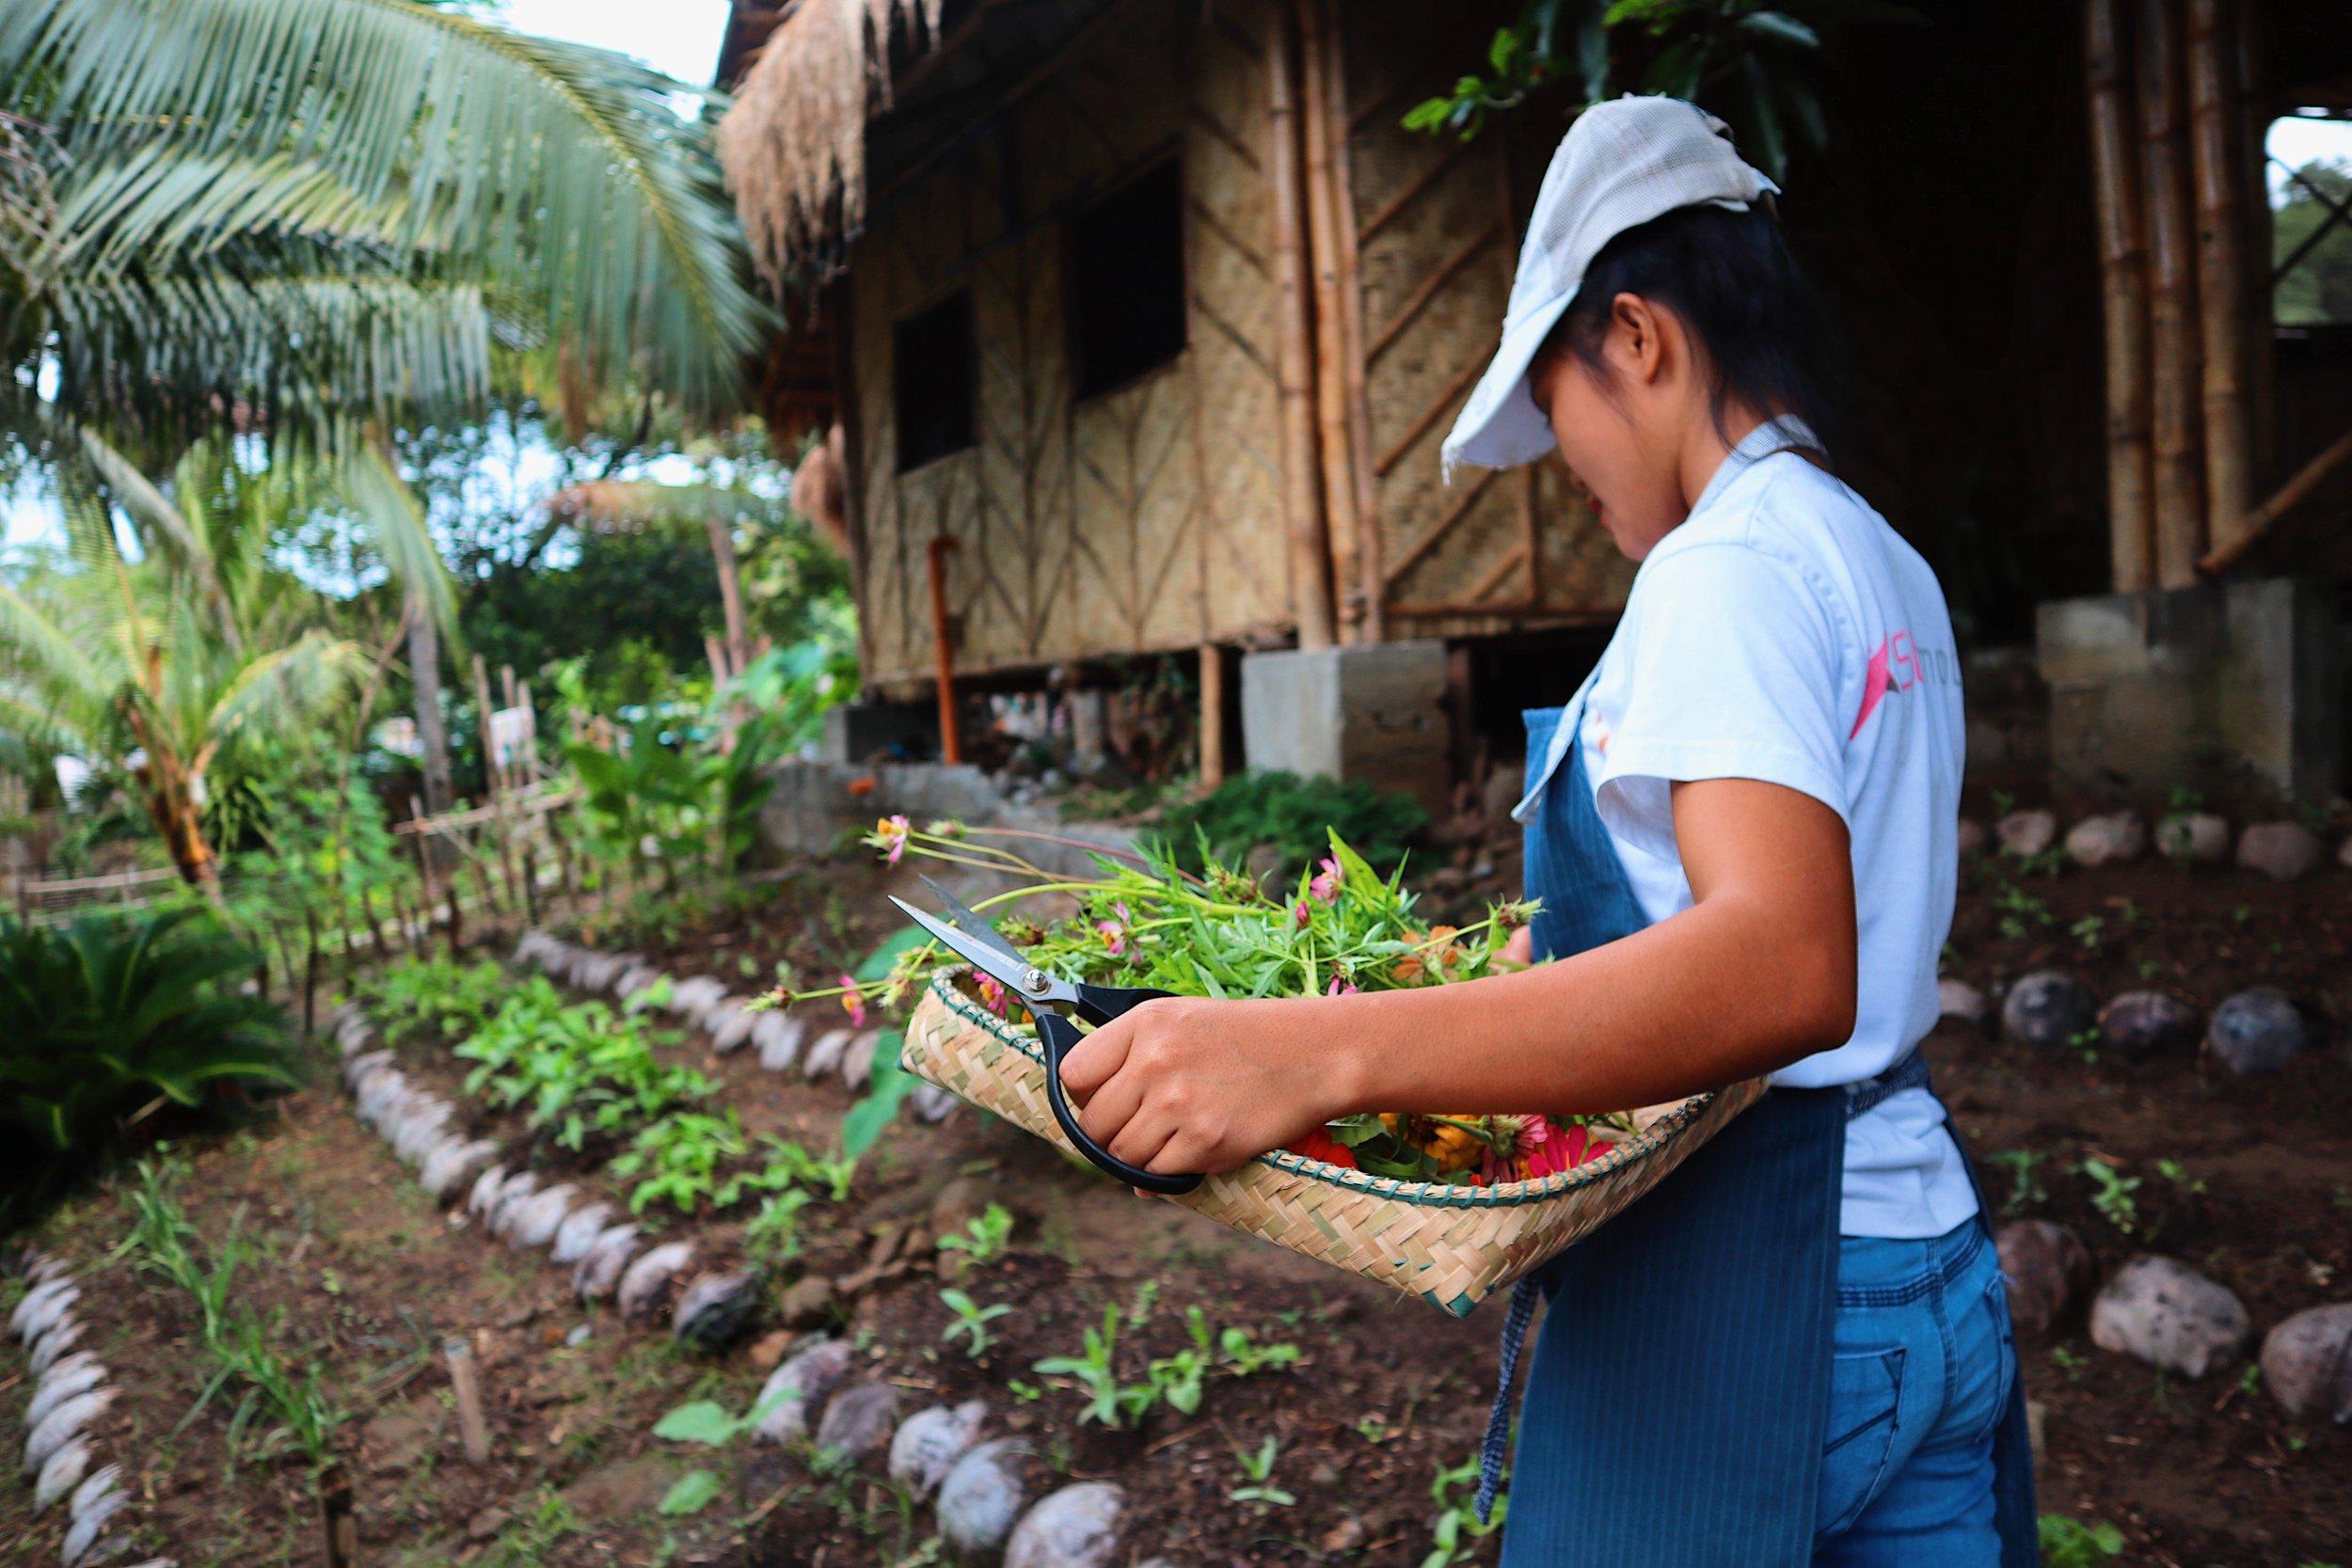 Daily Garden Harvests